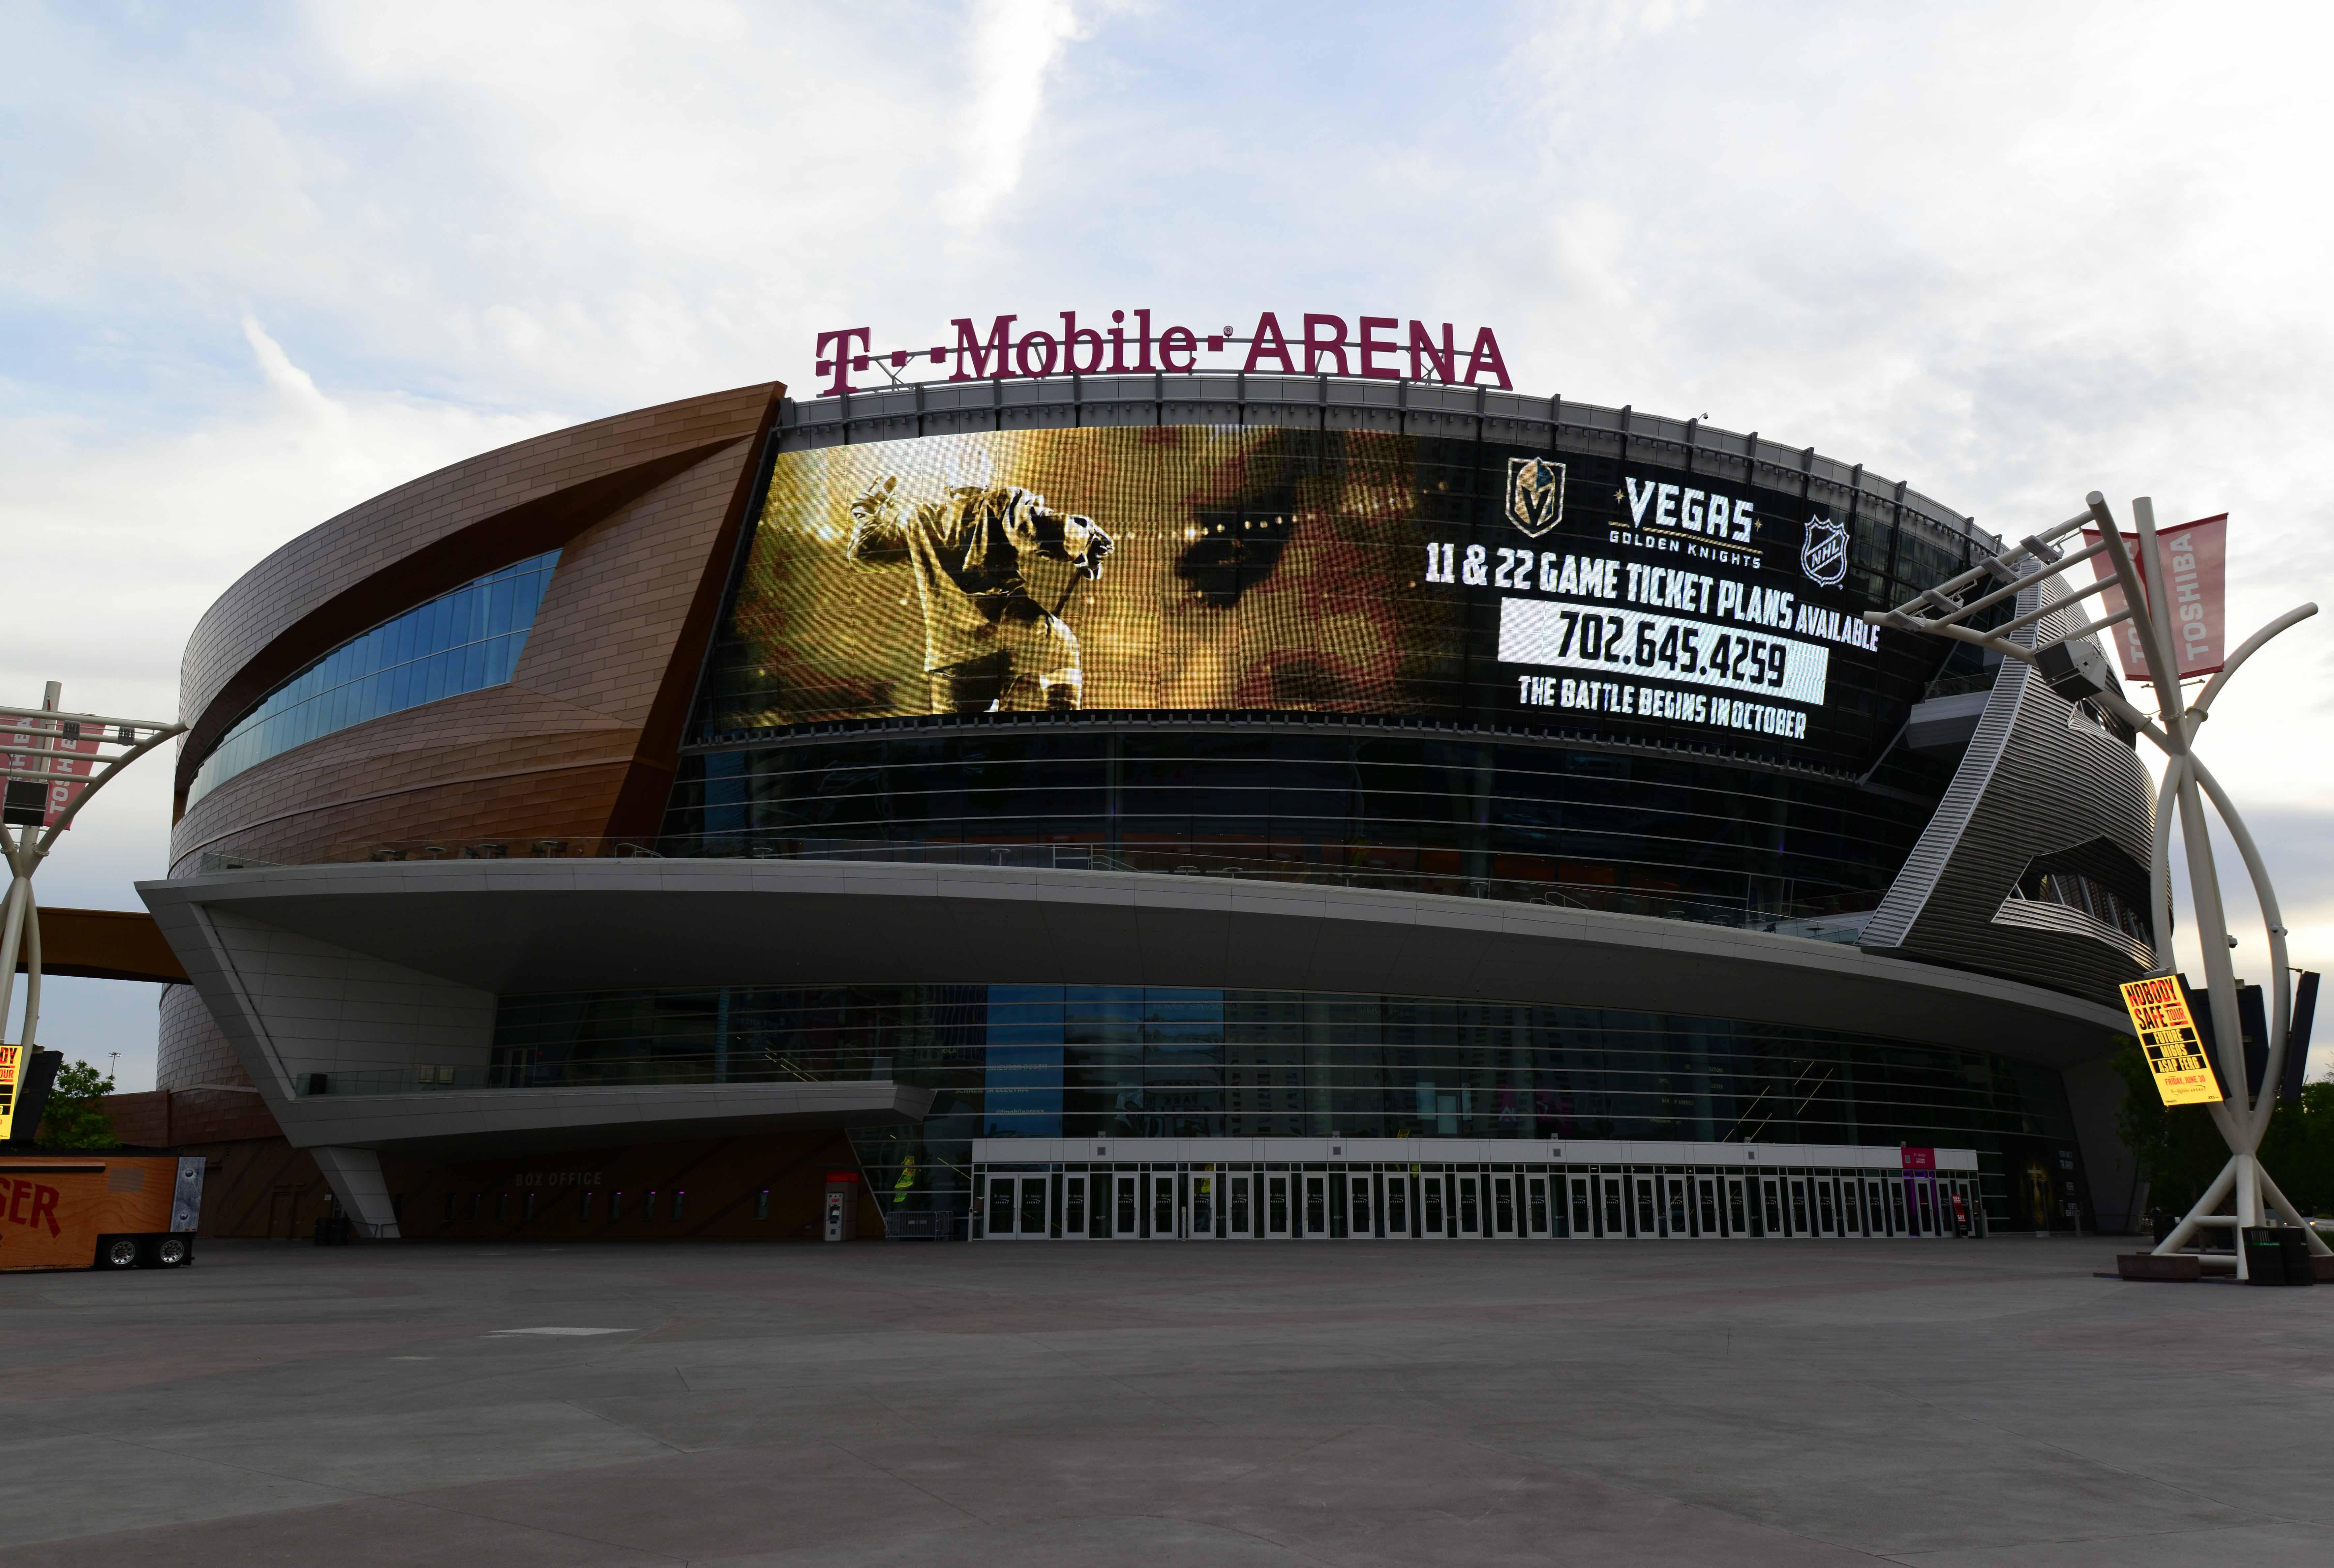 10089876-nhl-t-mobile-arena-views